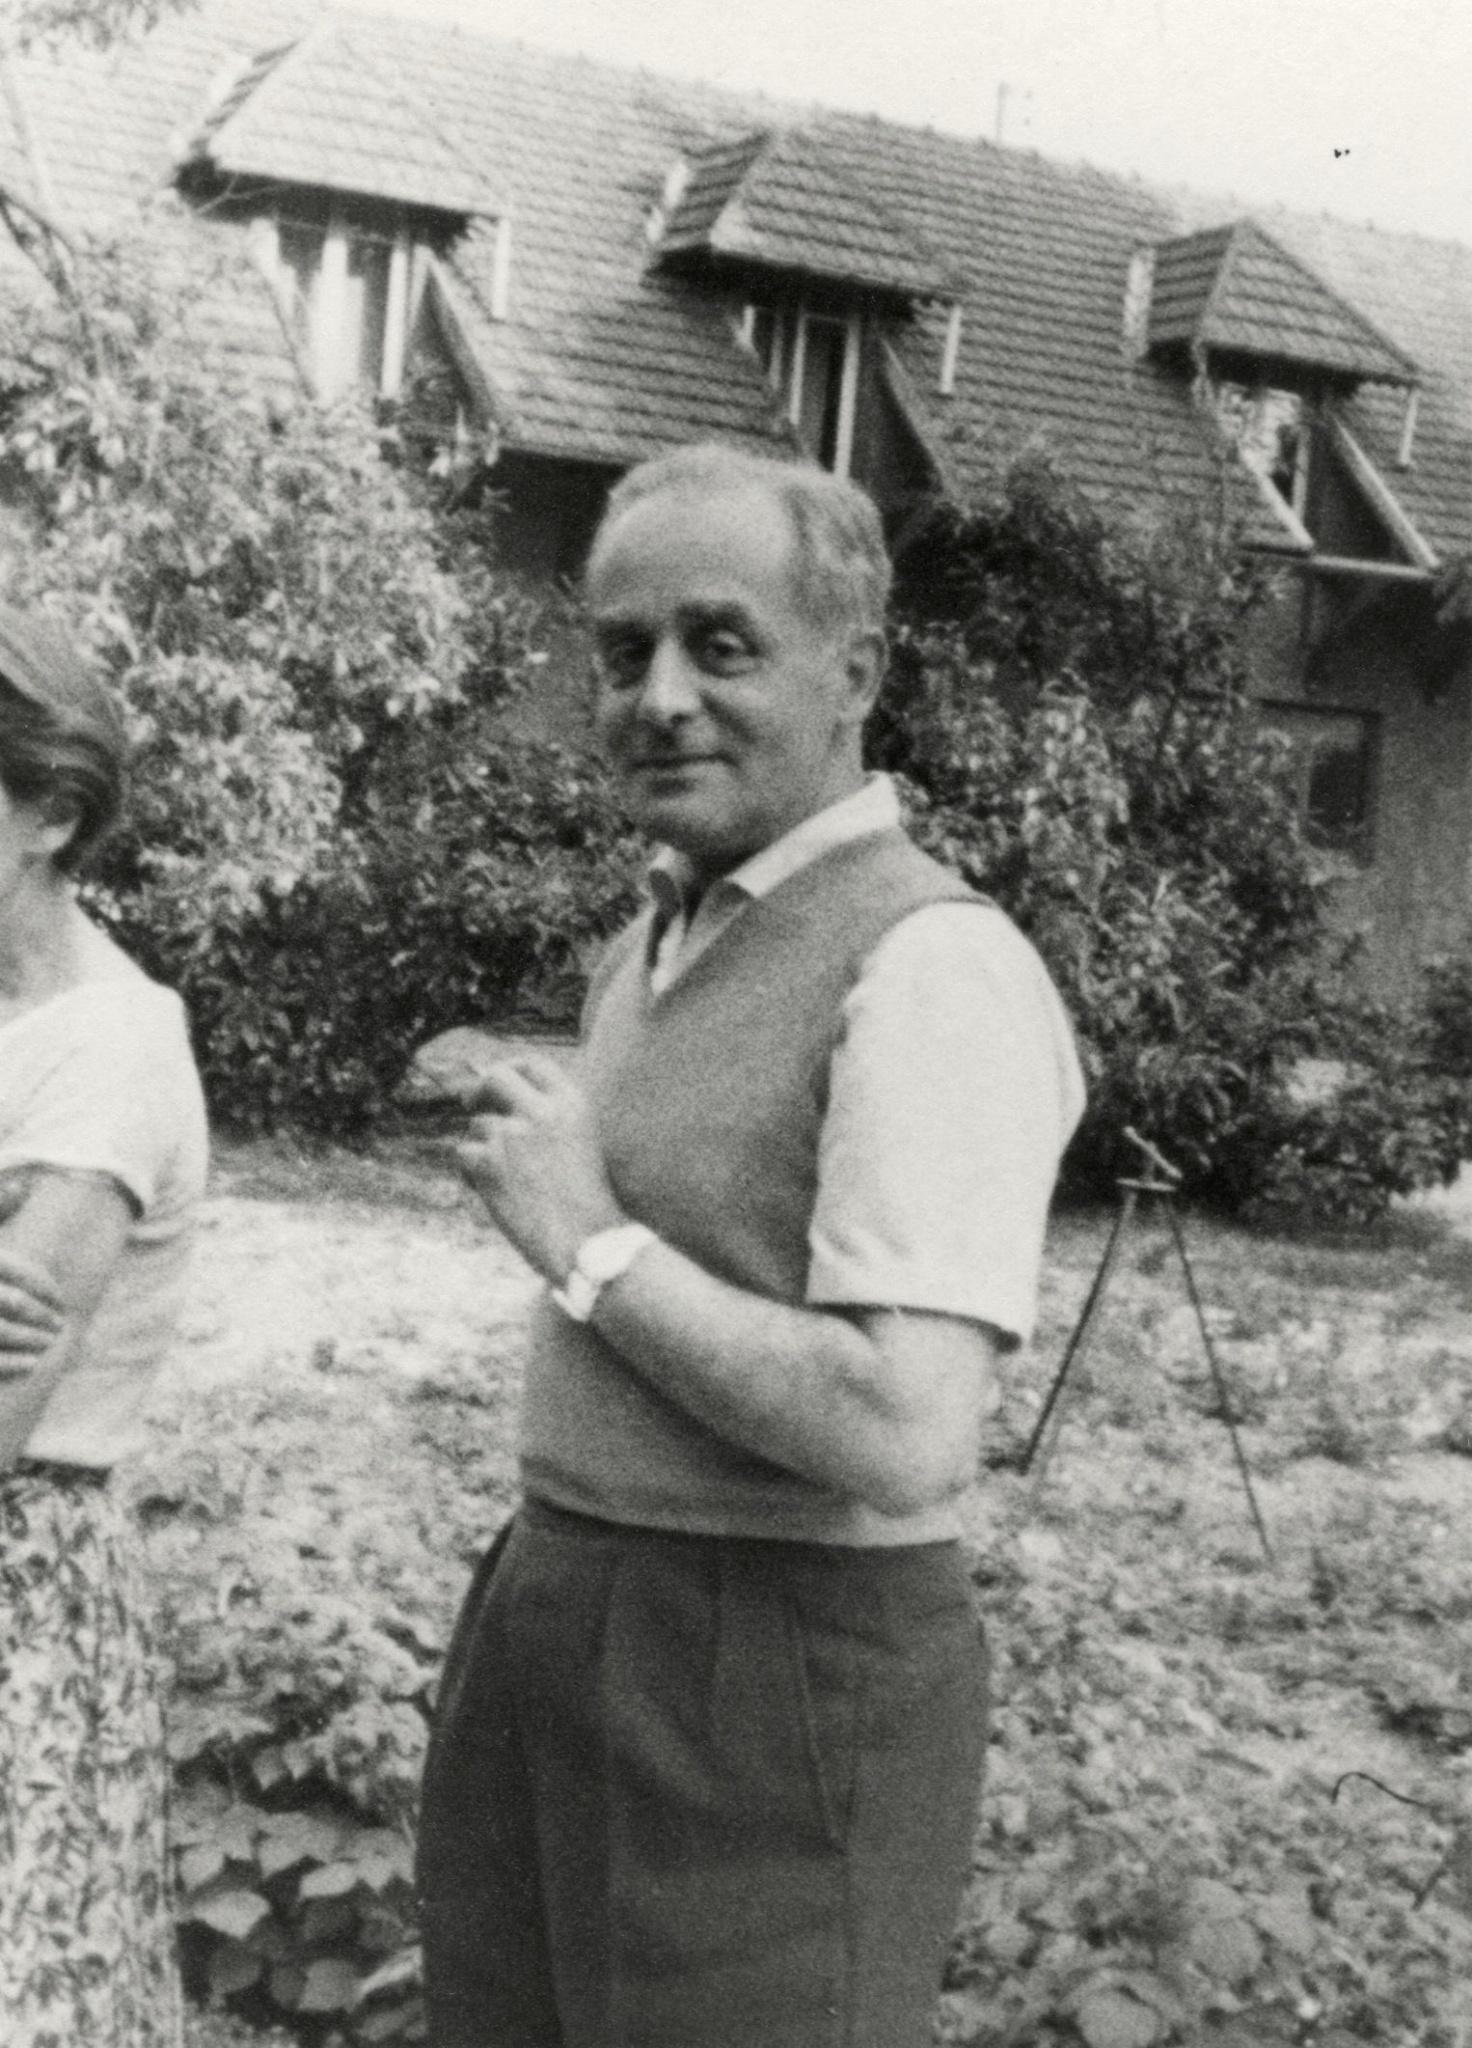 <div class='inner-box'><div class='close-desc'></div>  <span class='opis'>Jerzy Giedroyc. Maisons-Laffitte, zdjęcie z lat 1950-60</span>   </div>